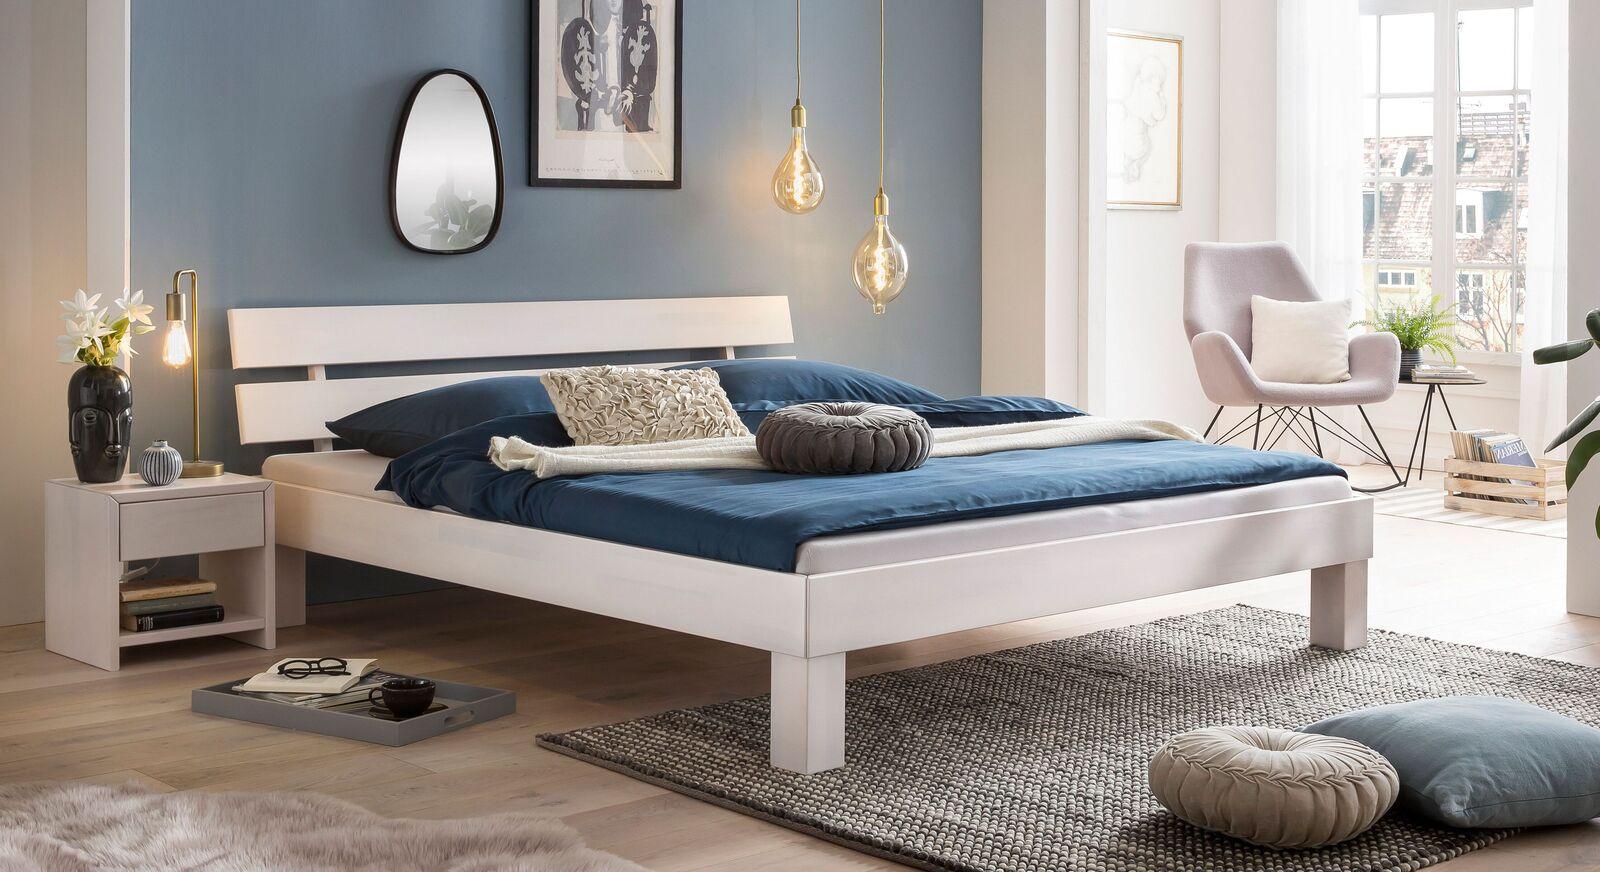 Bett Karmijn aus passende Produkte